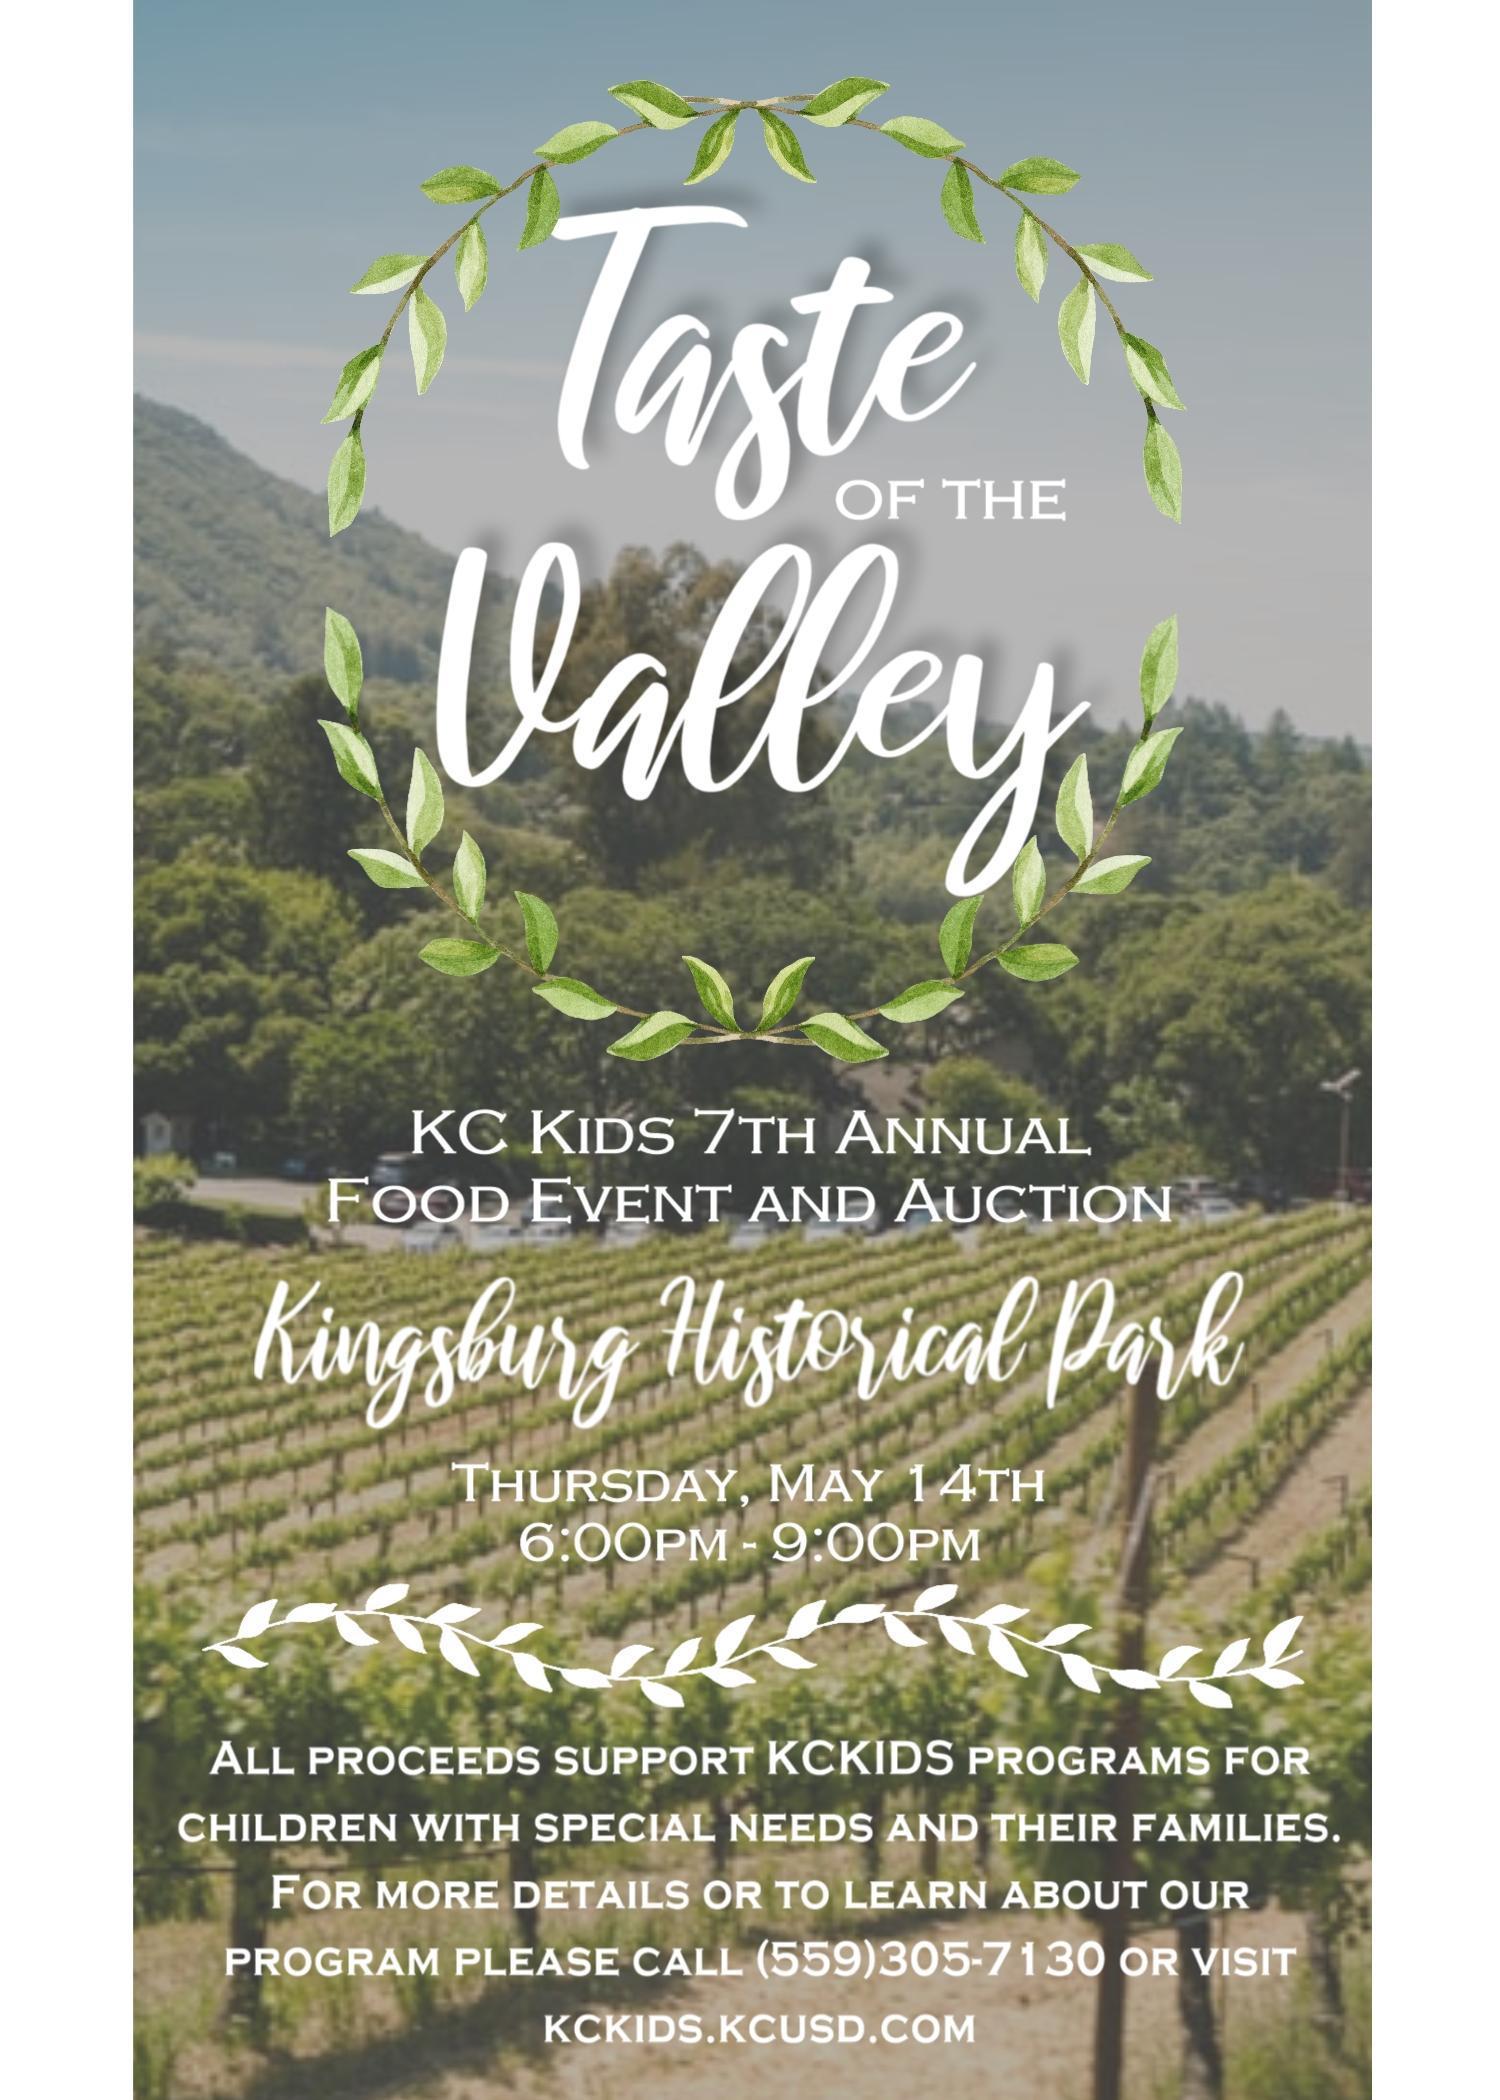 Taste of the Valley Flyer